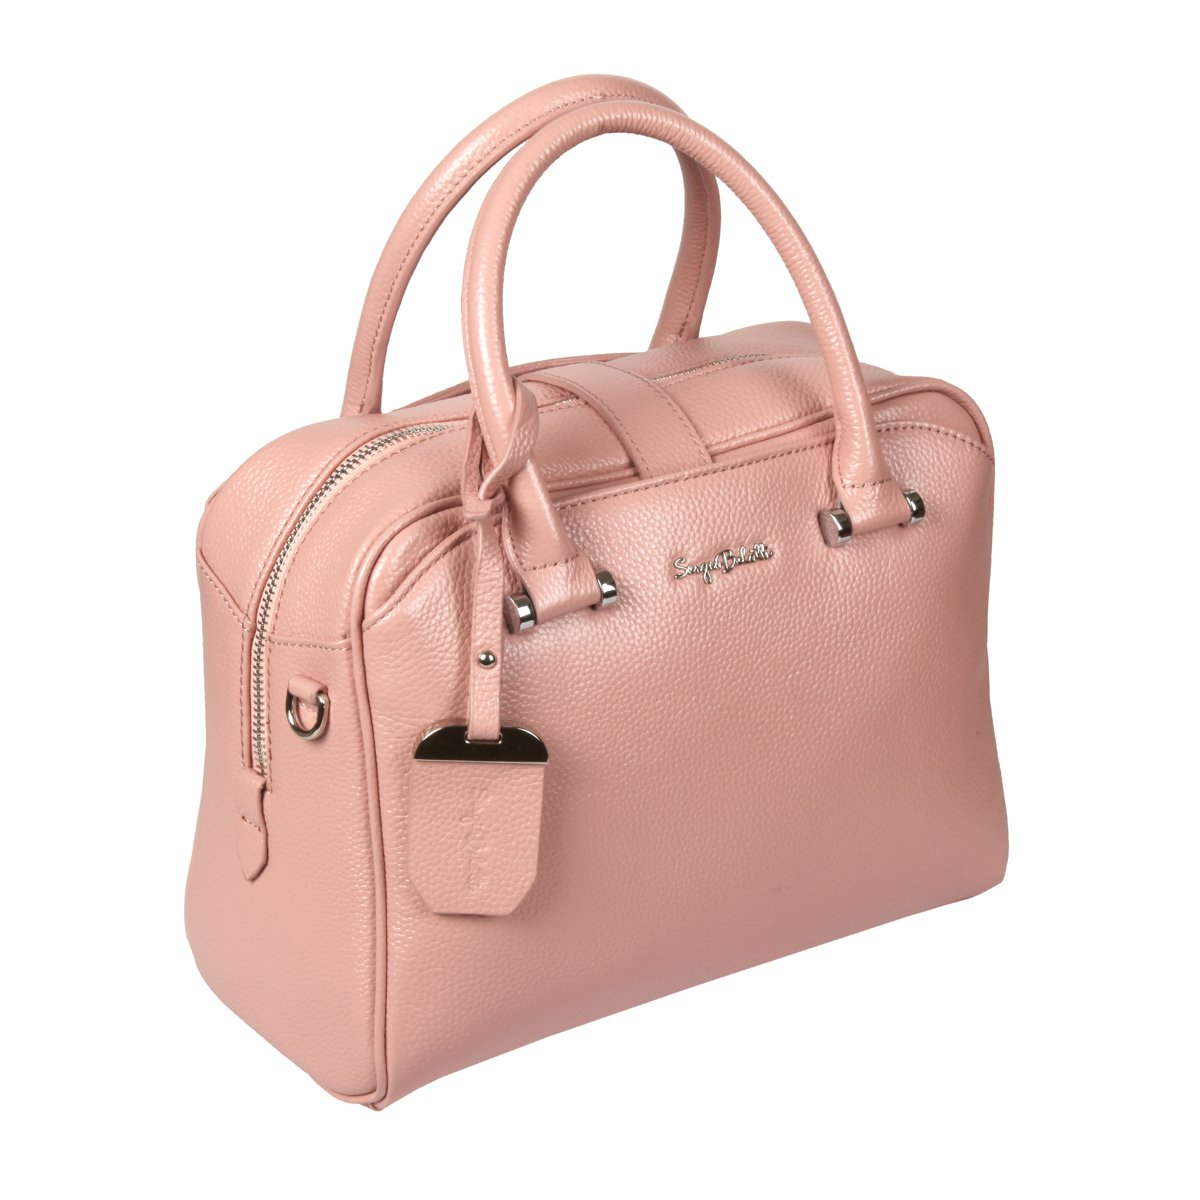 0a8fd643cdc5 Сумка Sergio Belotti 80 pink, 28x22 см, натуральная кожа, цвет ...